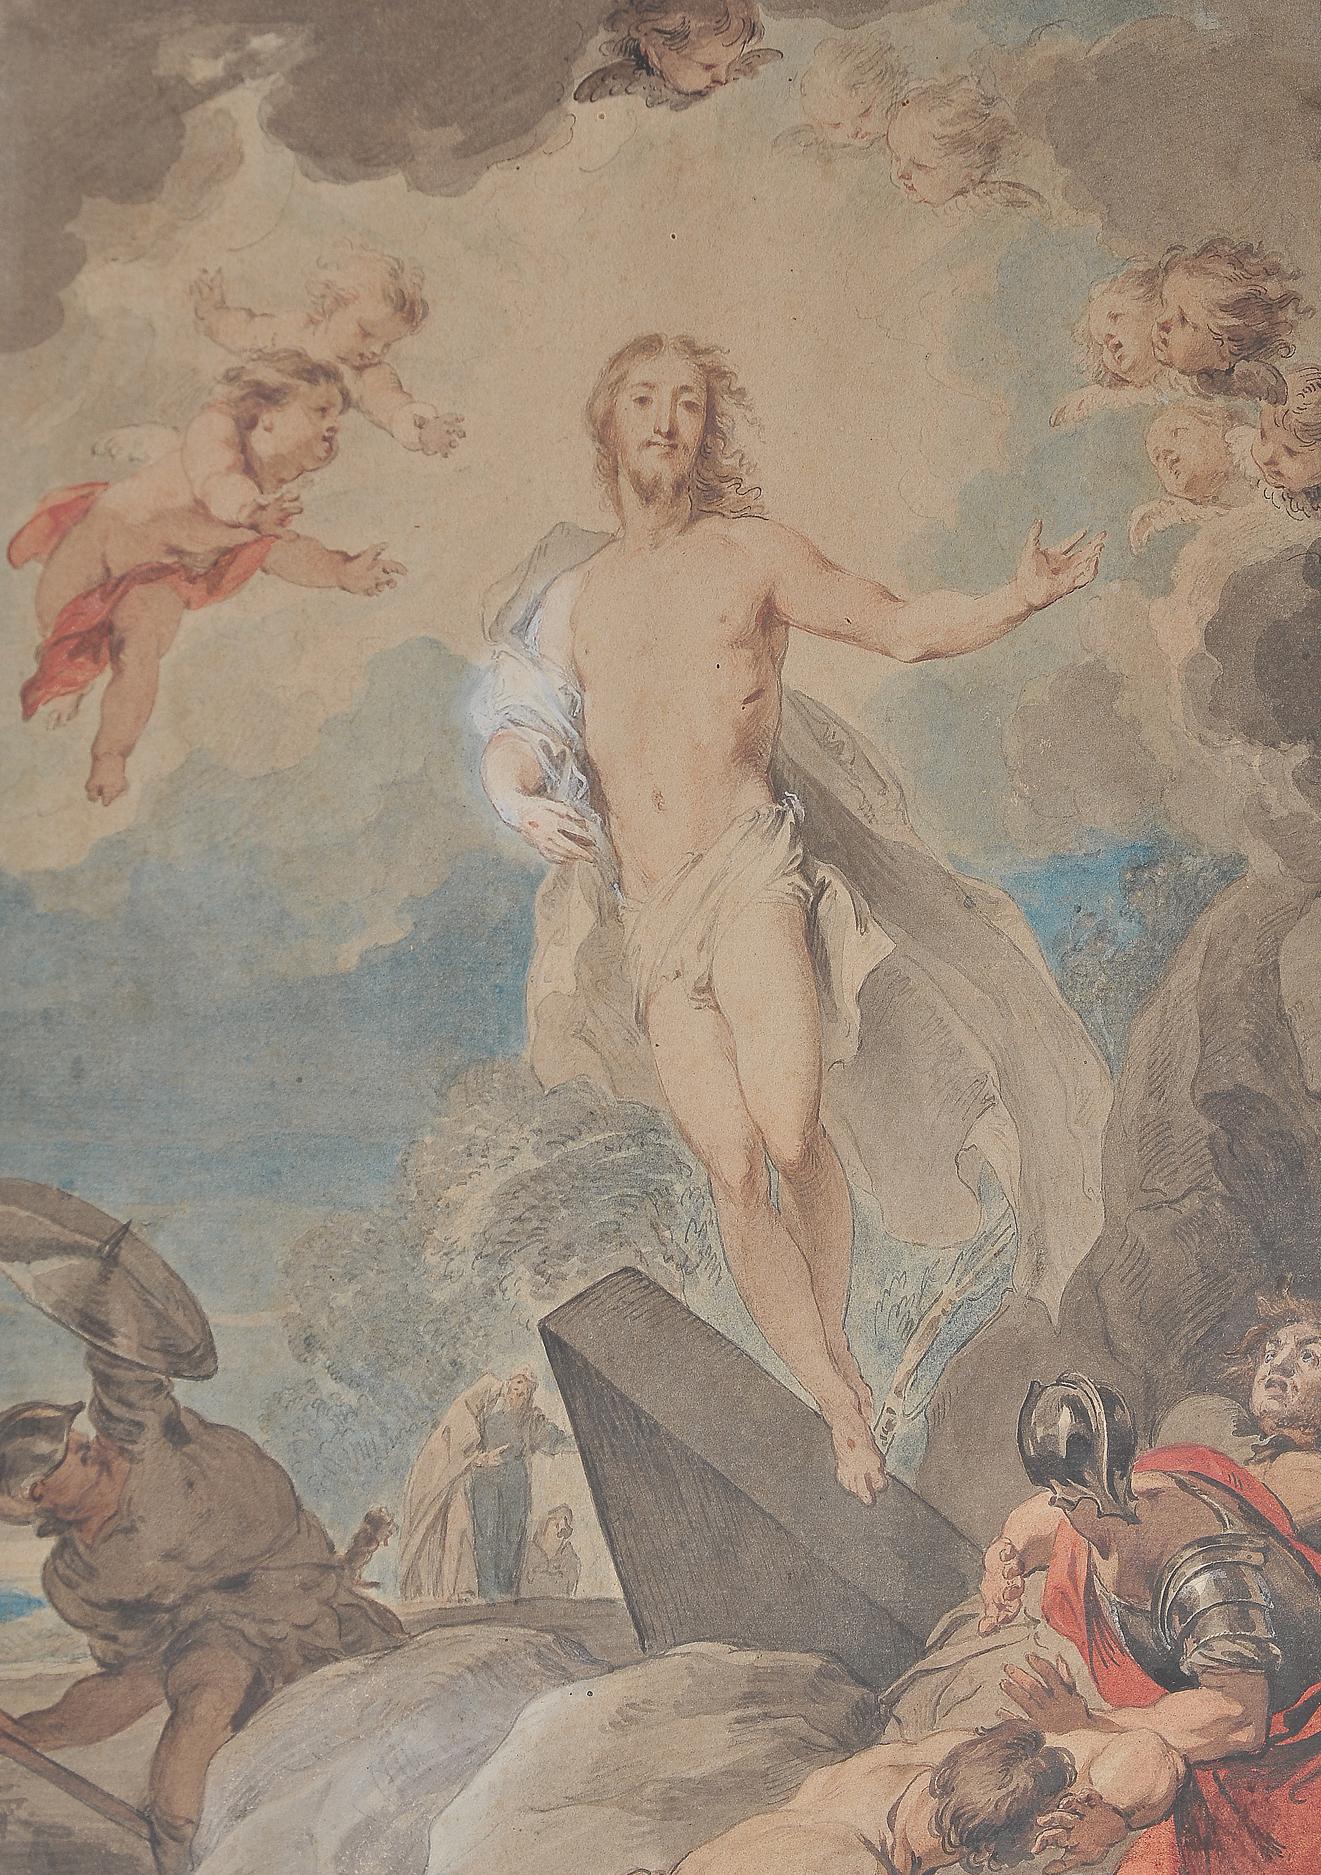 Jakob de Witt, Amsterdam 1695 - 1754, Auferstehung - Image 6 of 9